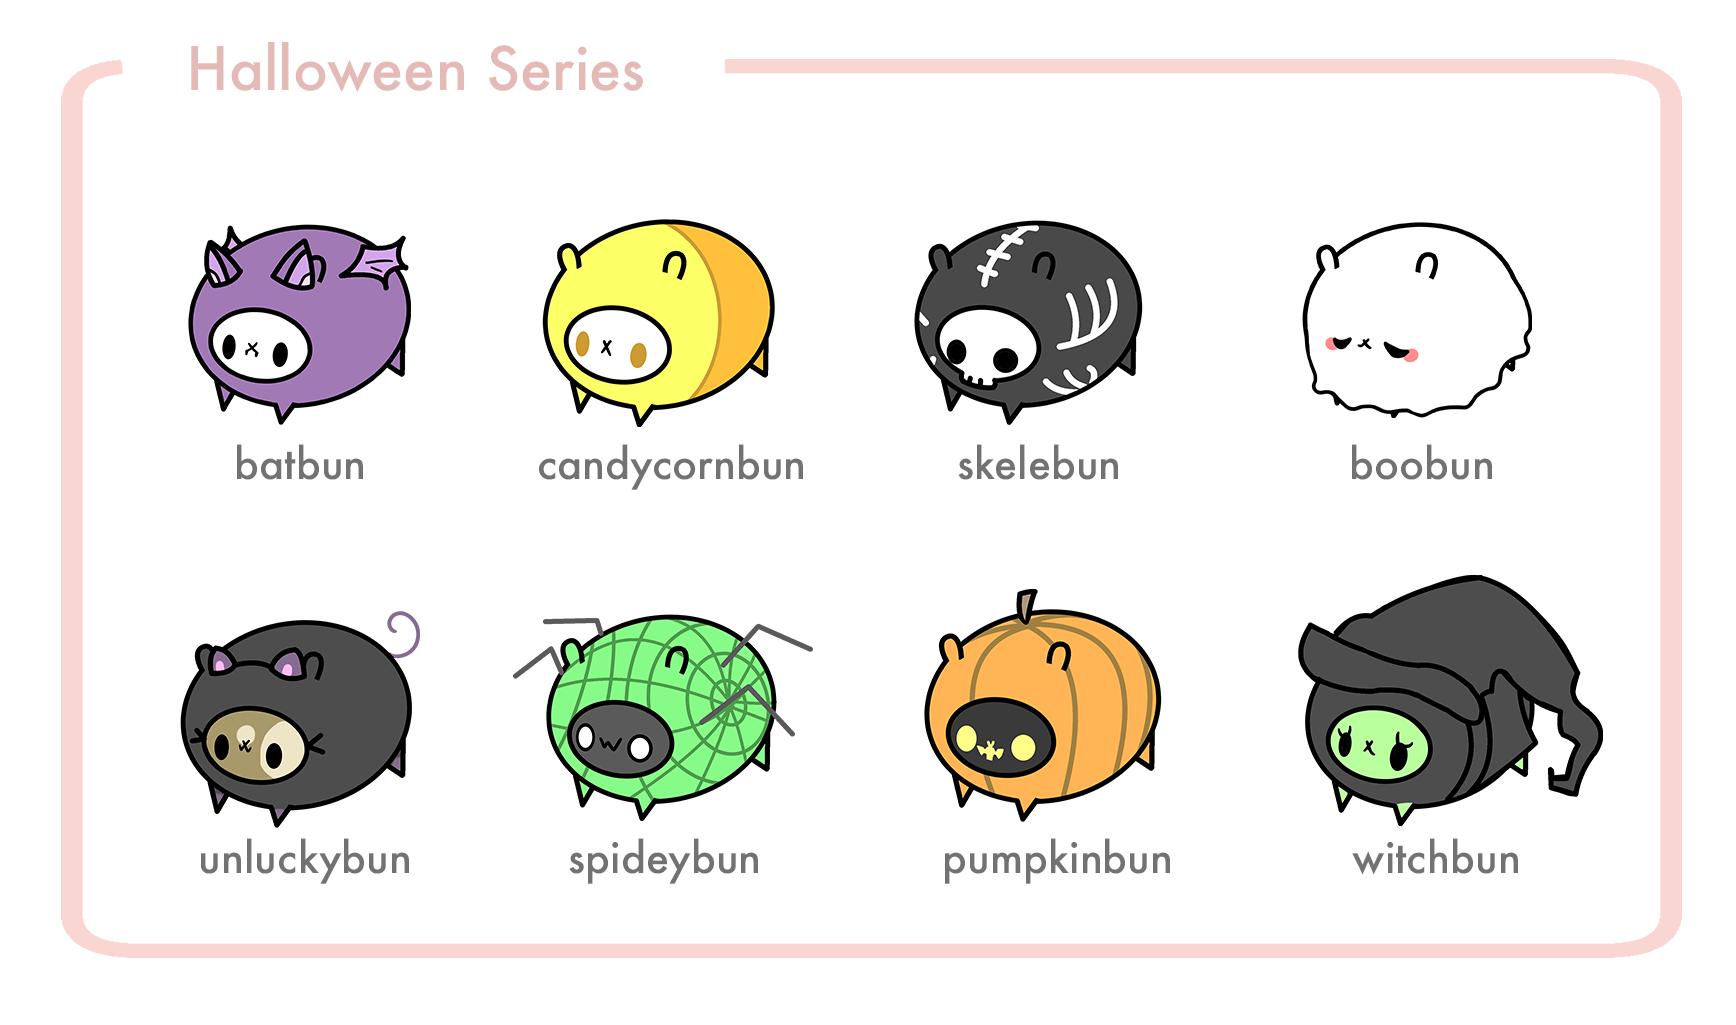 Halloween Series